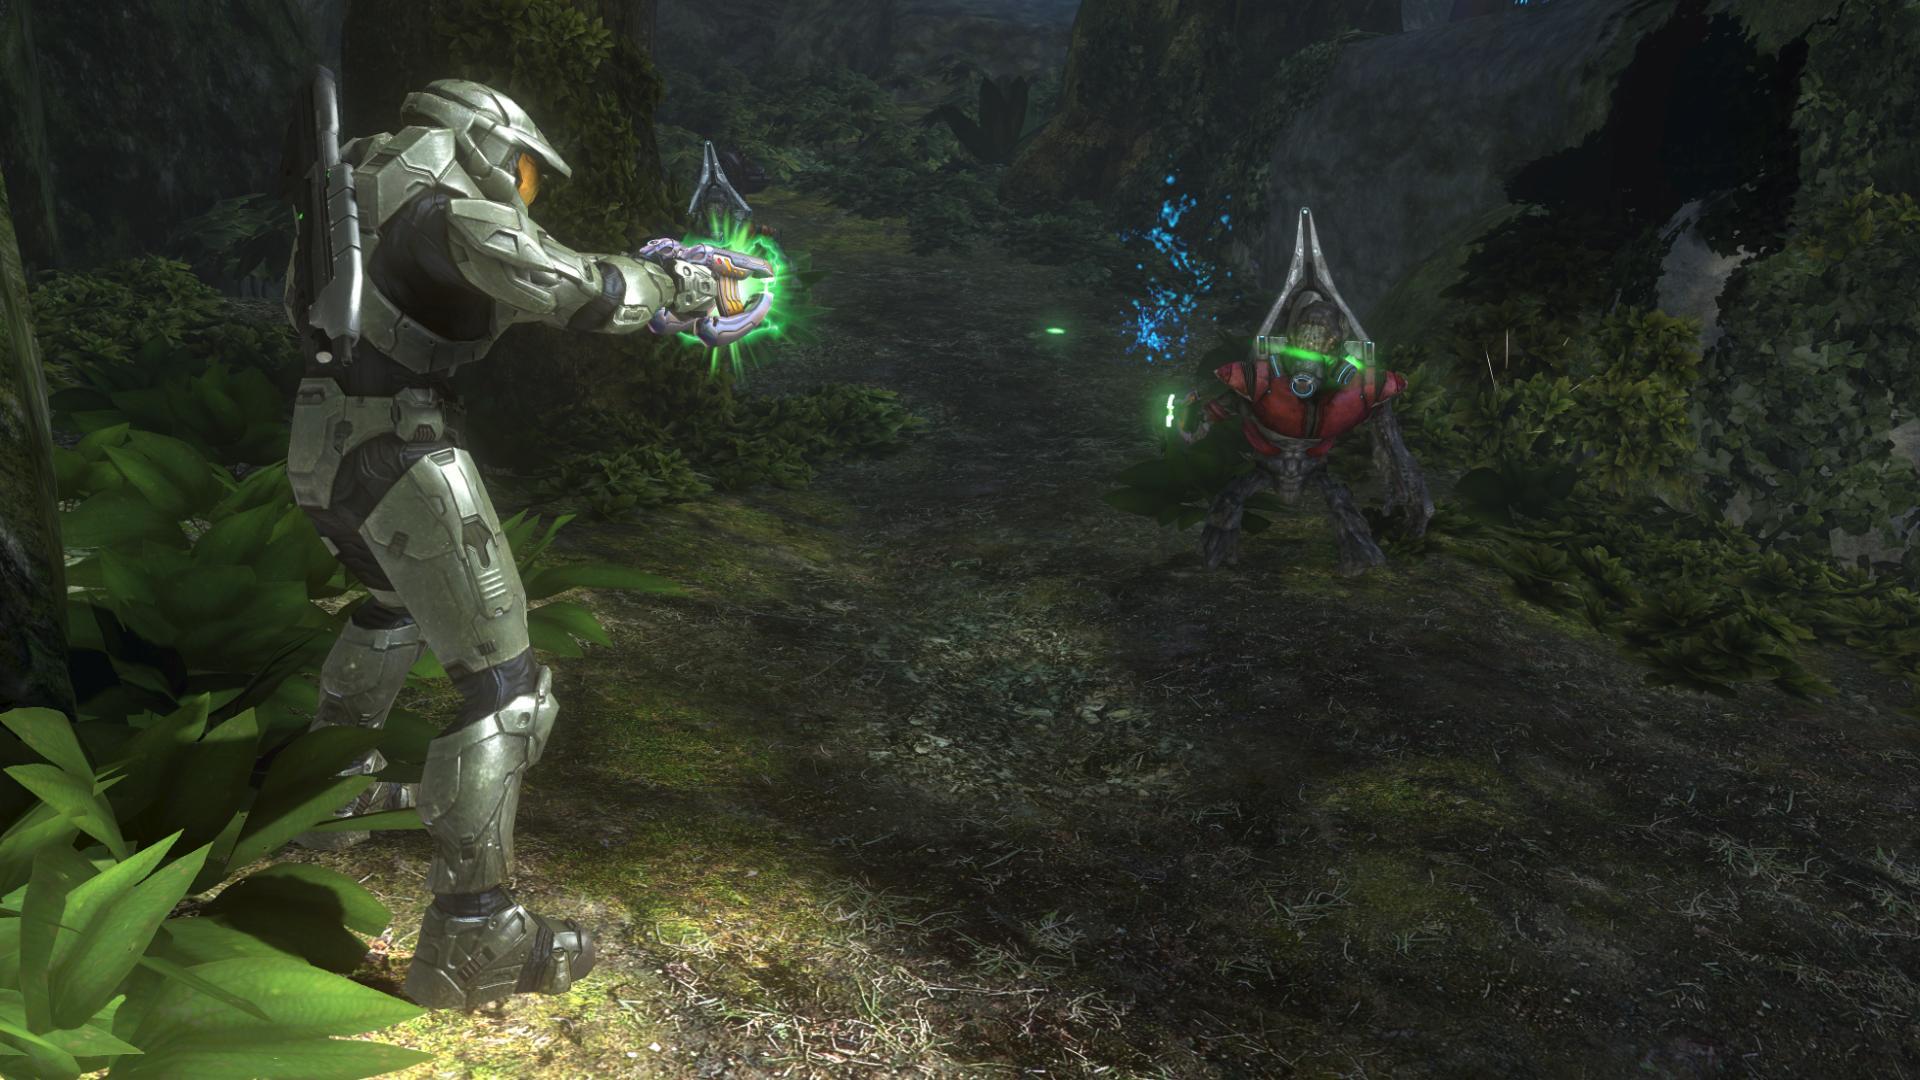 1521480602 116452f233 o Halo 3: Plasma Fire